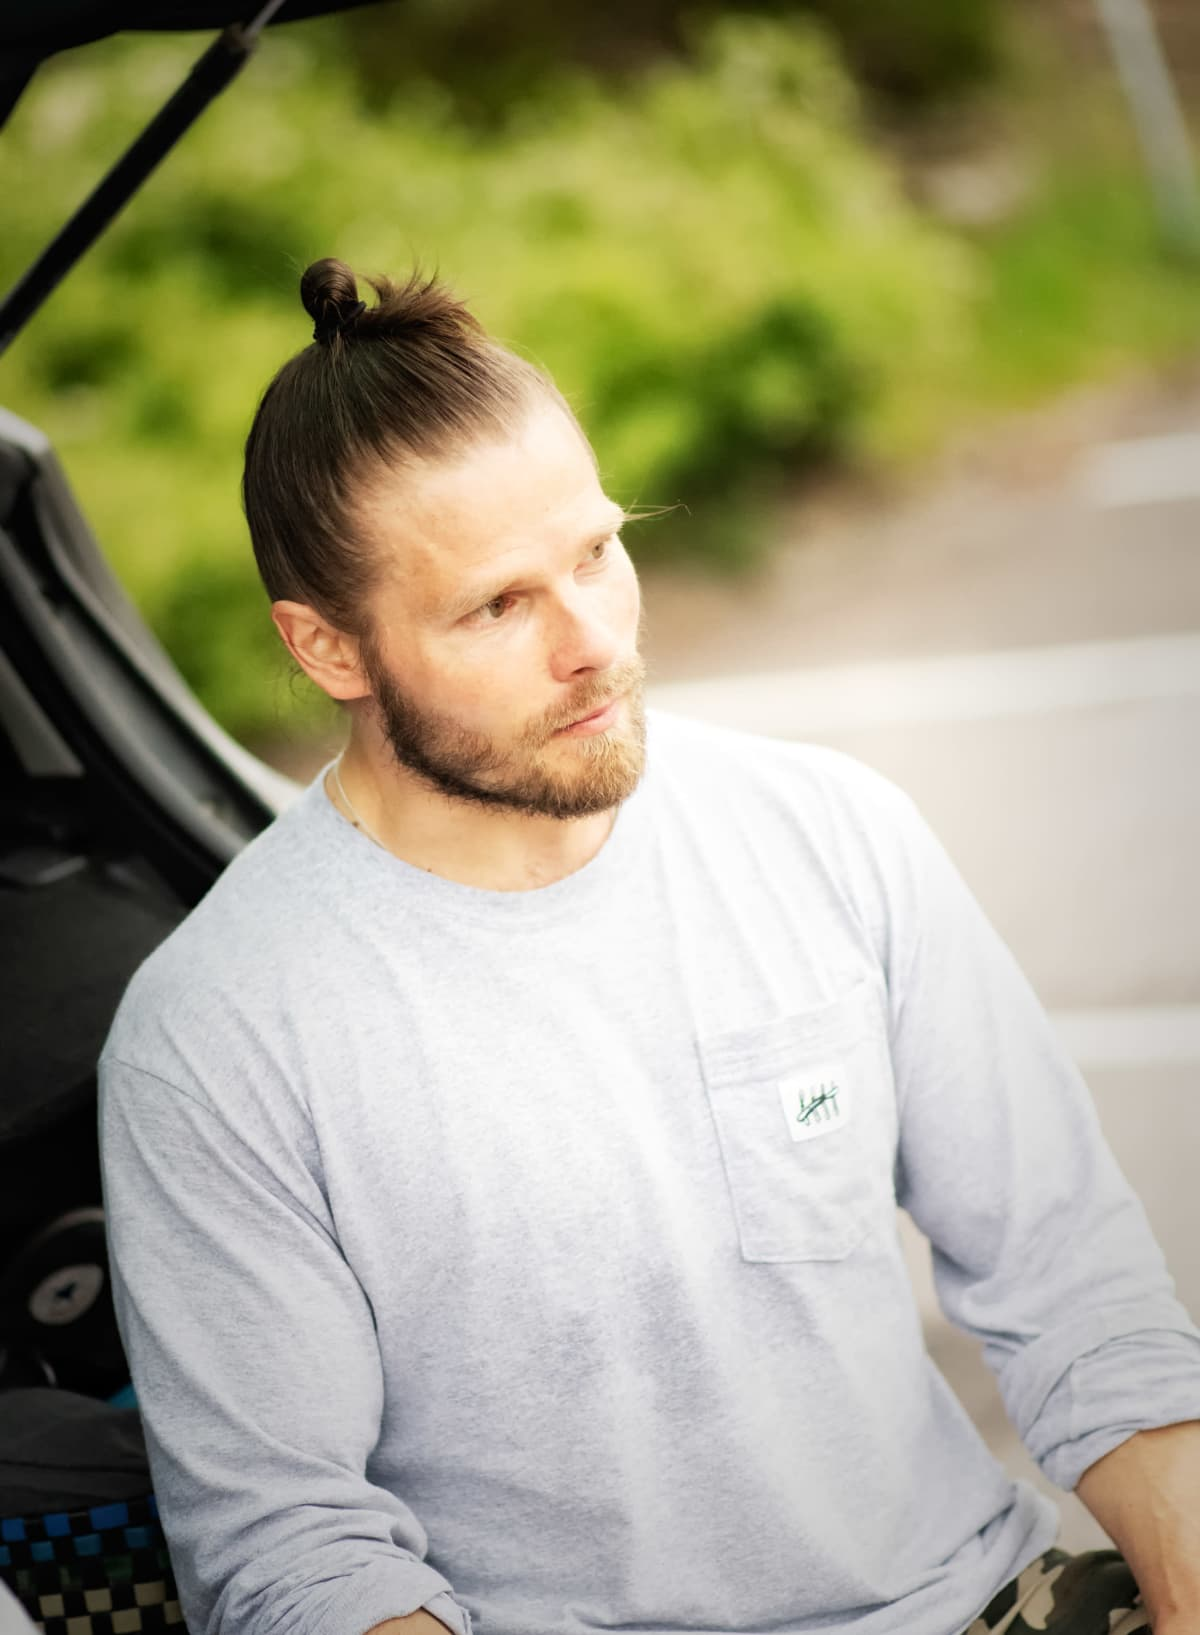 Lauri Rantanen